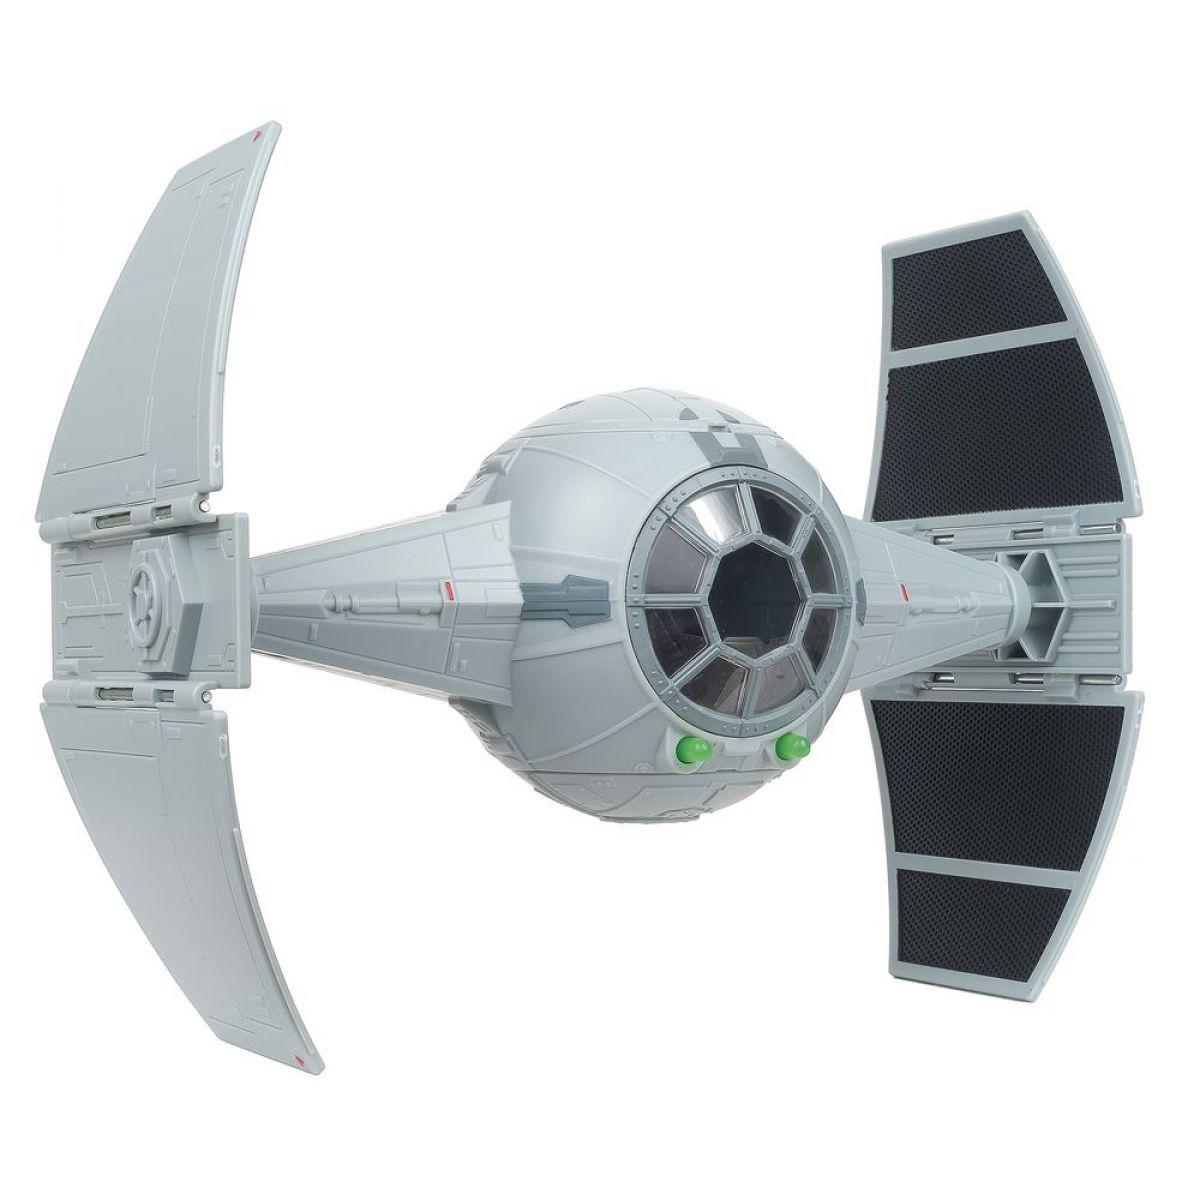 Hasbro Star Wars Vesmírná vozidla II - The Inquisitor's Tie Advenced Prototype